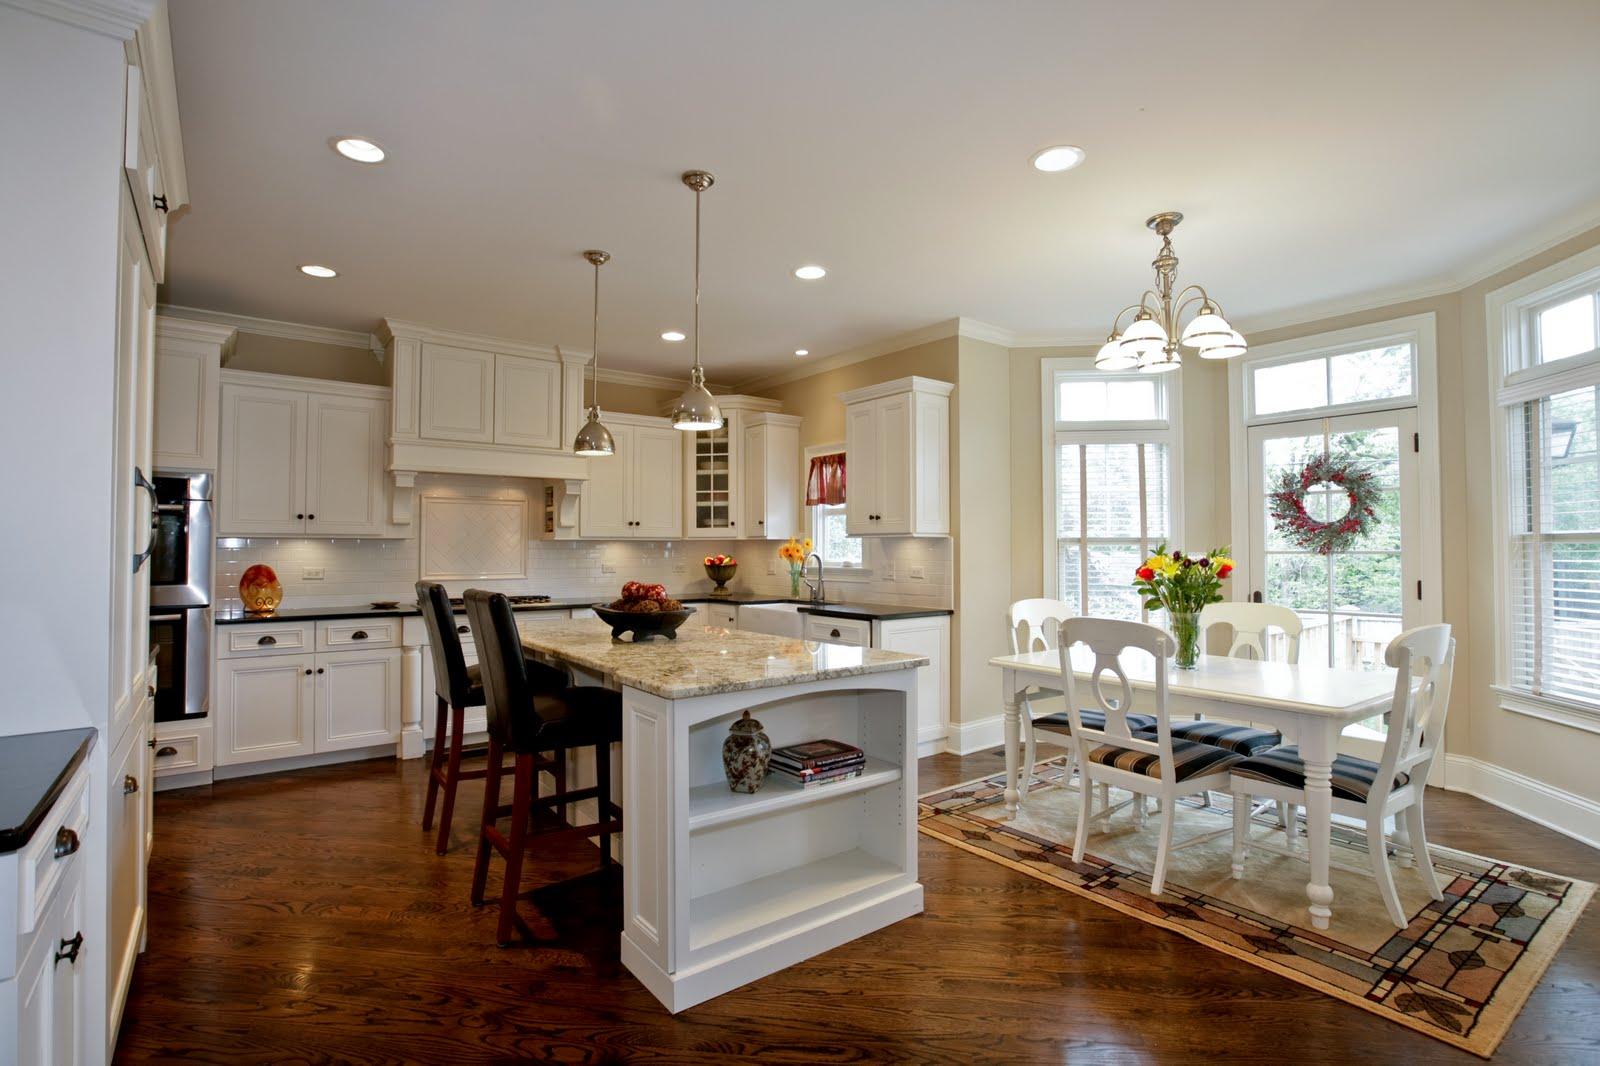 Oakley Homebuilders: Coastal style living near Randall Park